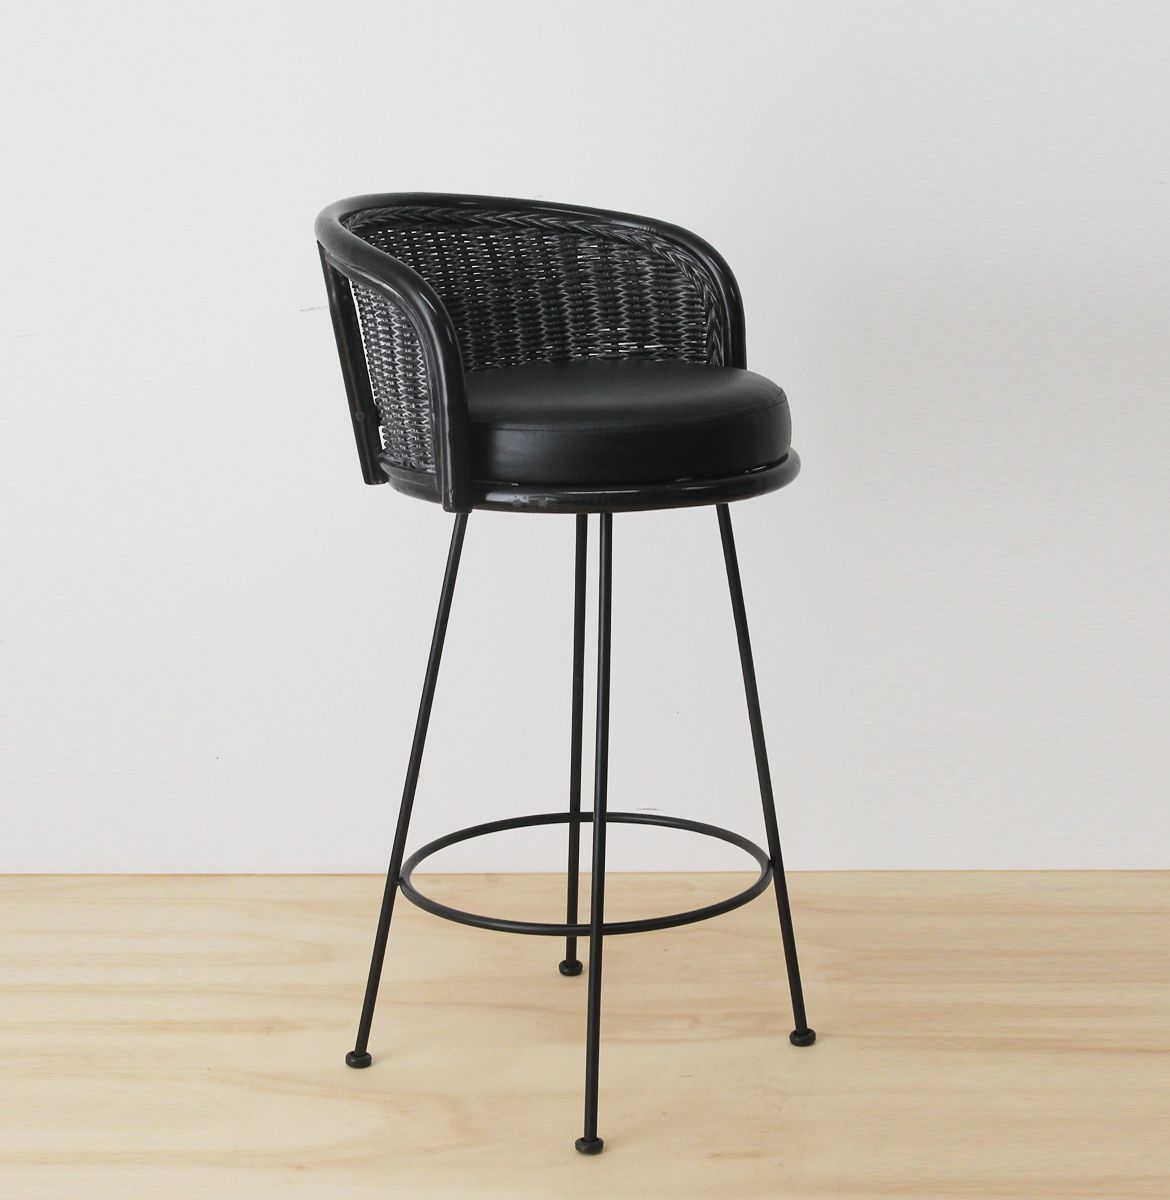 Sake Barstool Bar Stools Contemporary Furniture Furniture